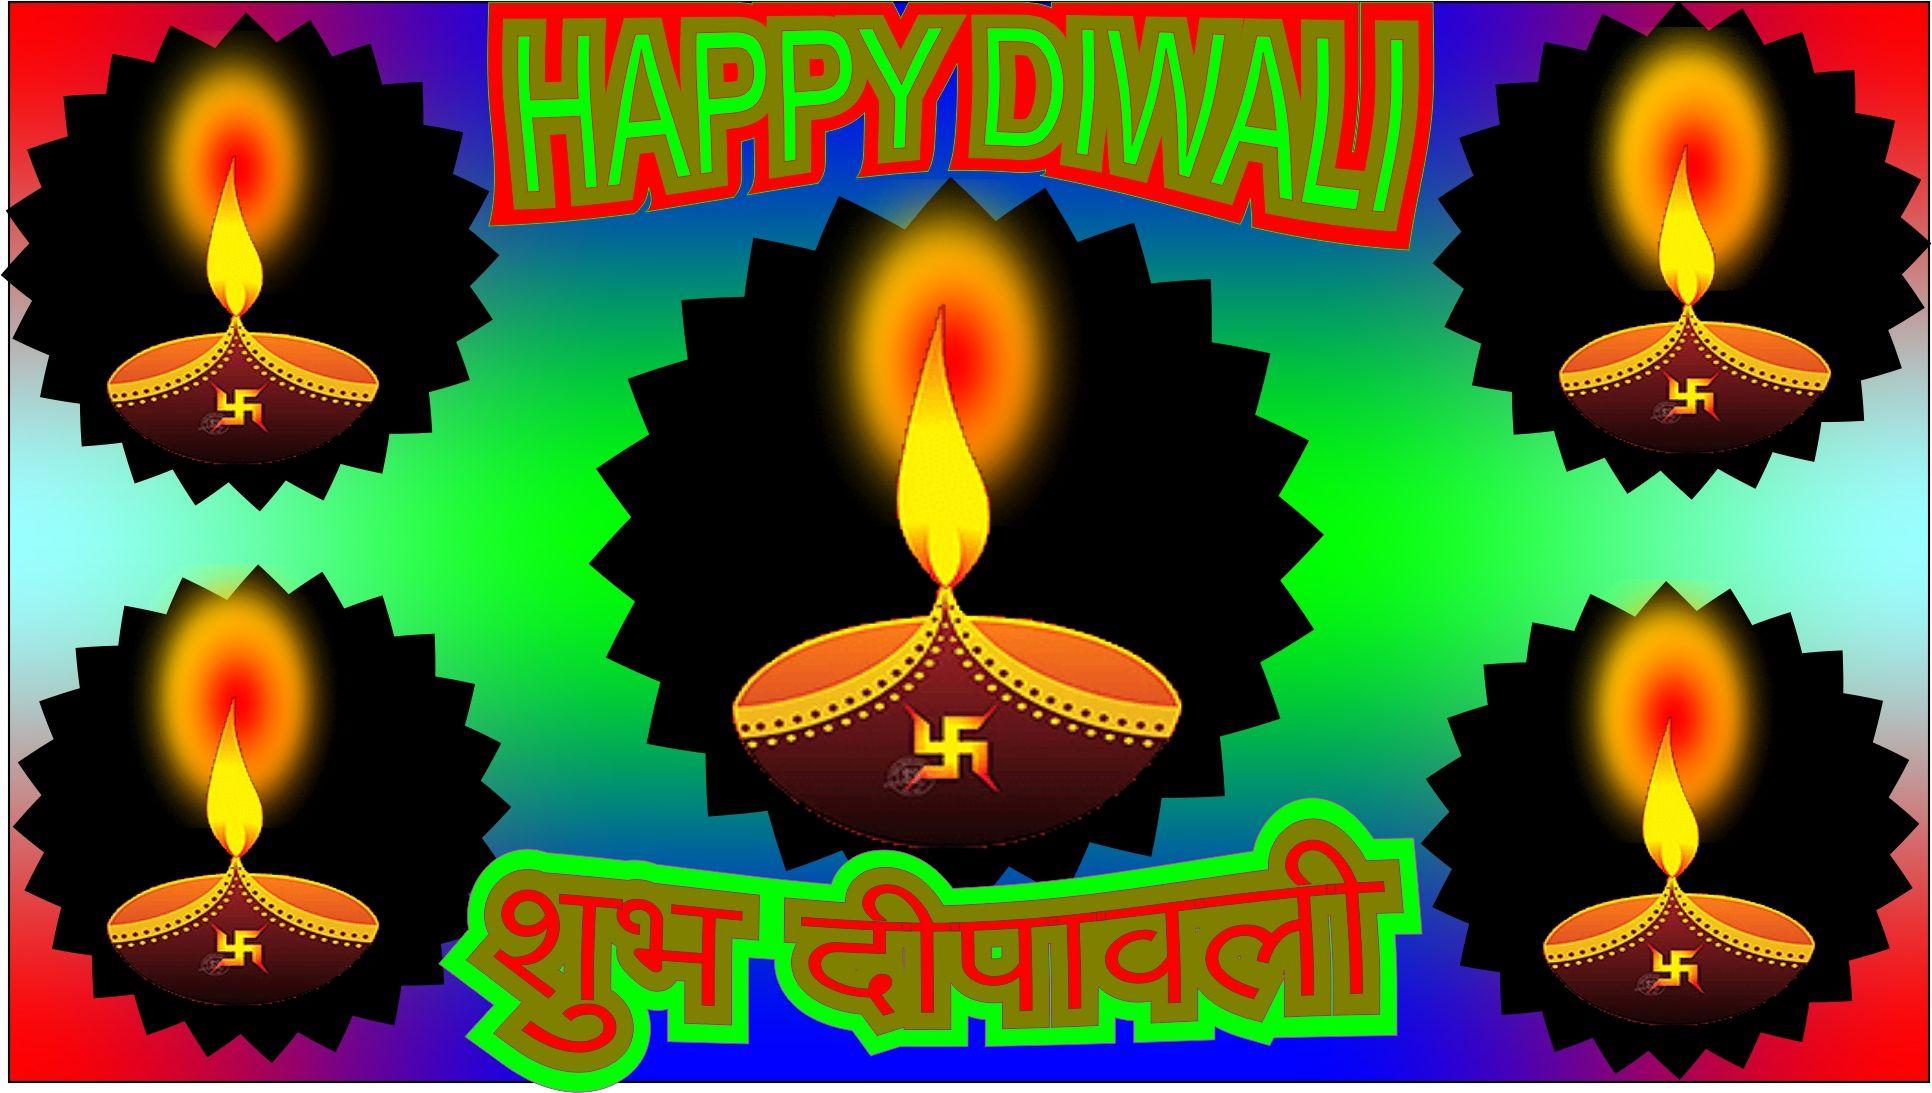 Best Happy Diwali 2018 Wishes in Hindi, Happy Diwali